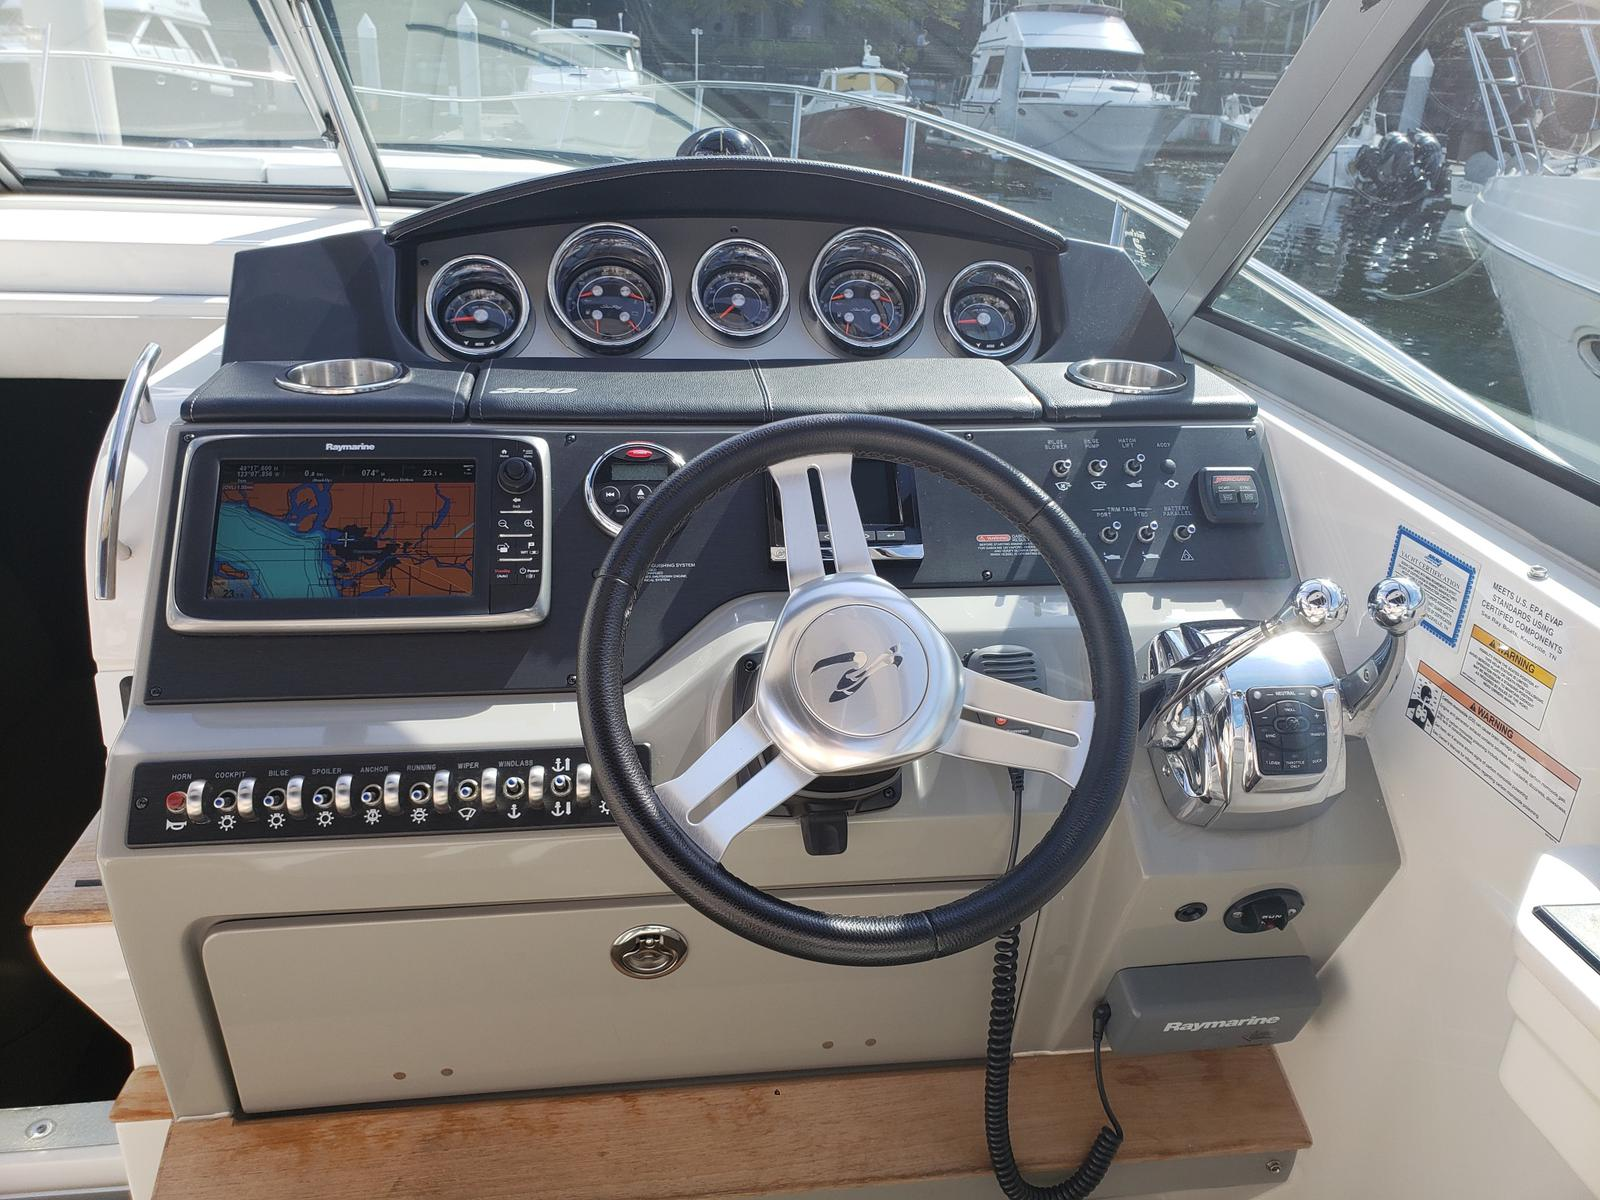 2014 Sea Ray 350 Sundancer for sale in Vancouver, BC  M & P Mercury